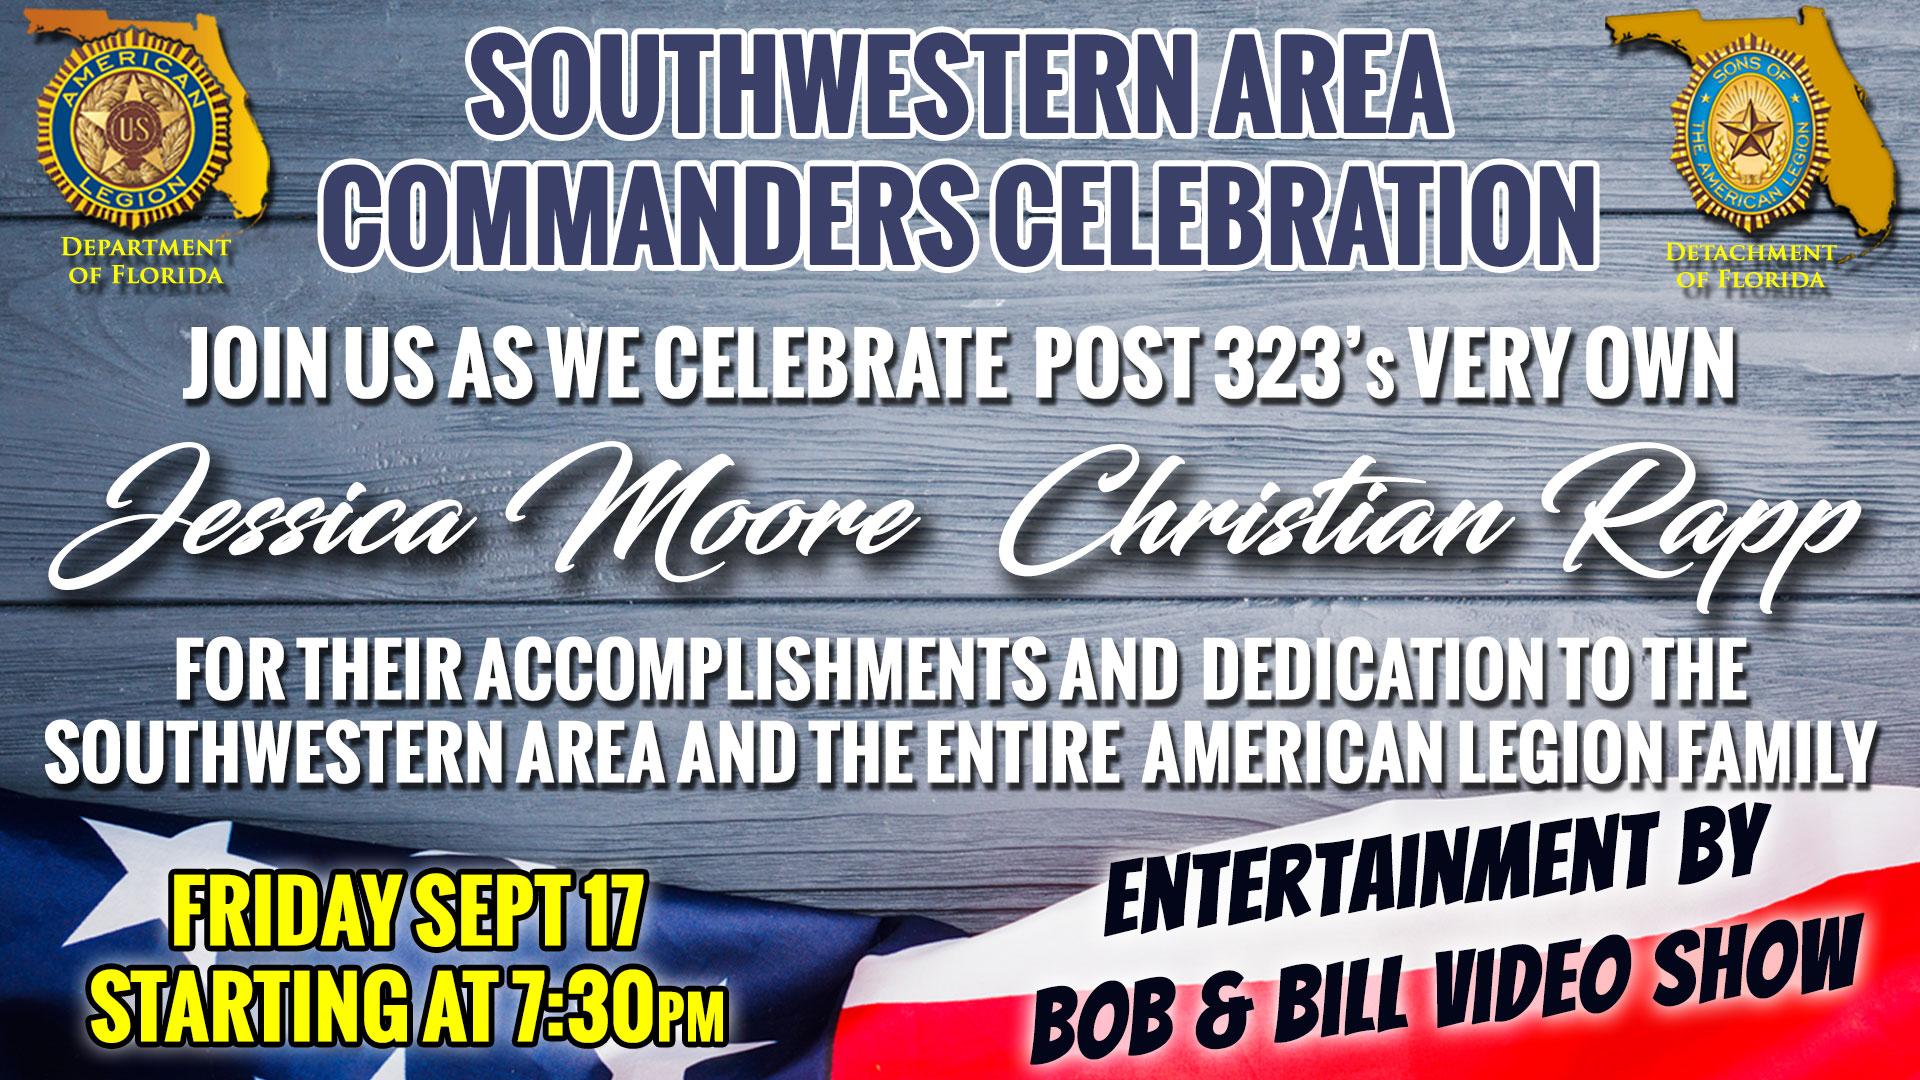 SW Area Commanders Celebration